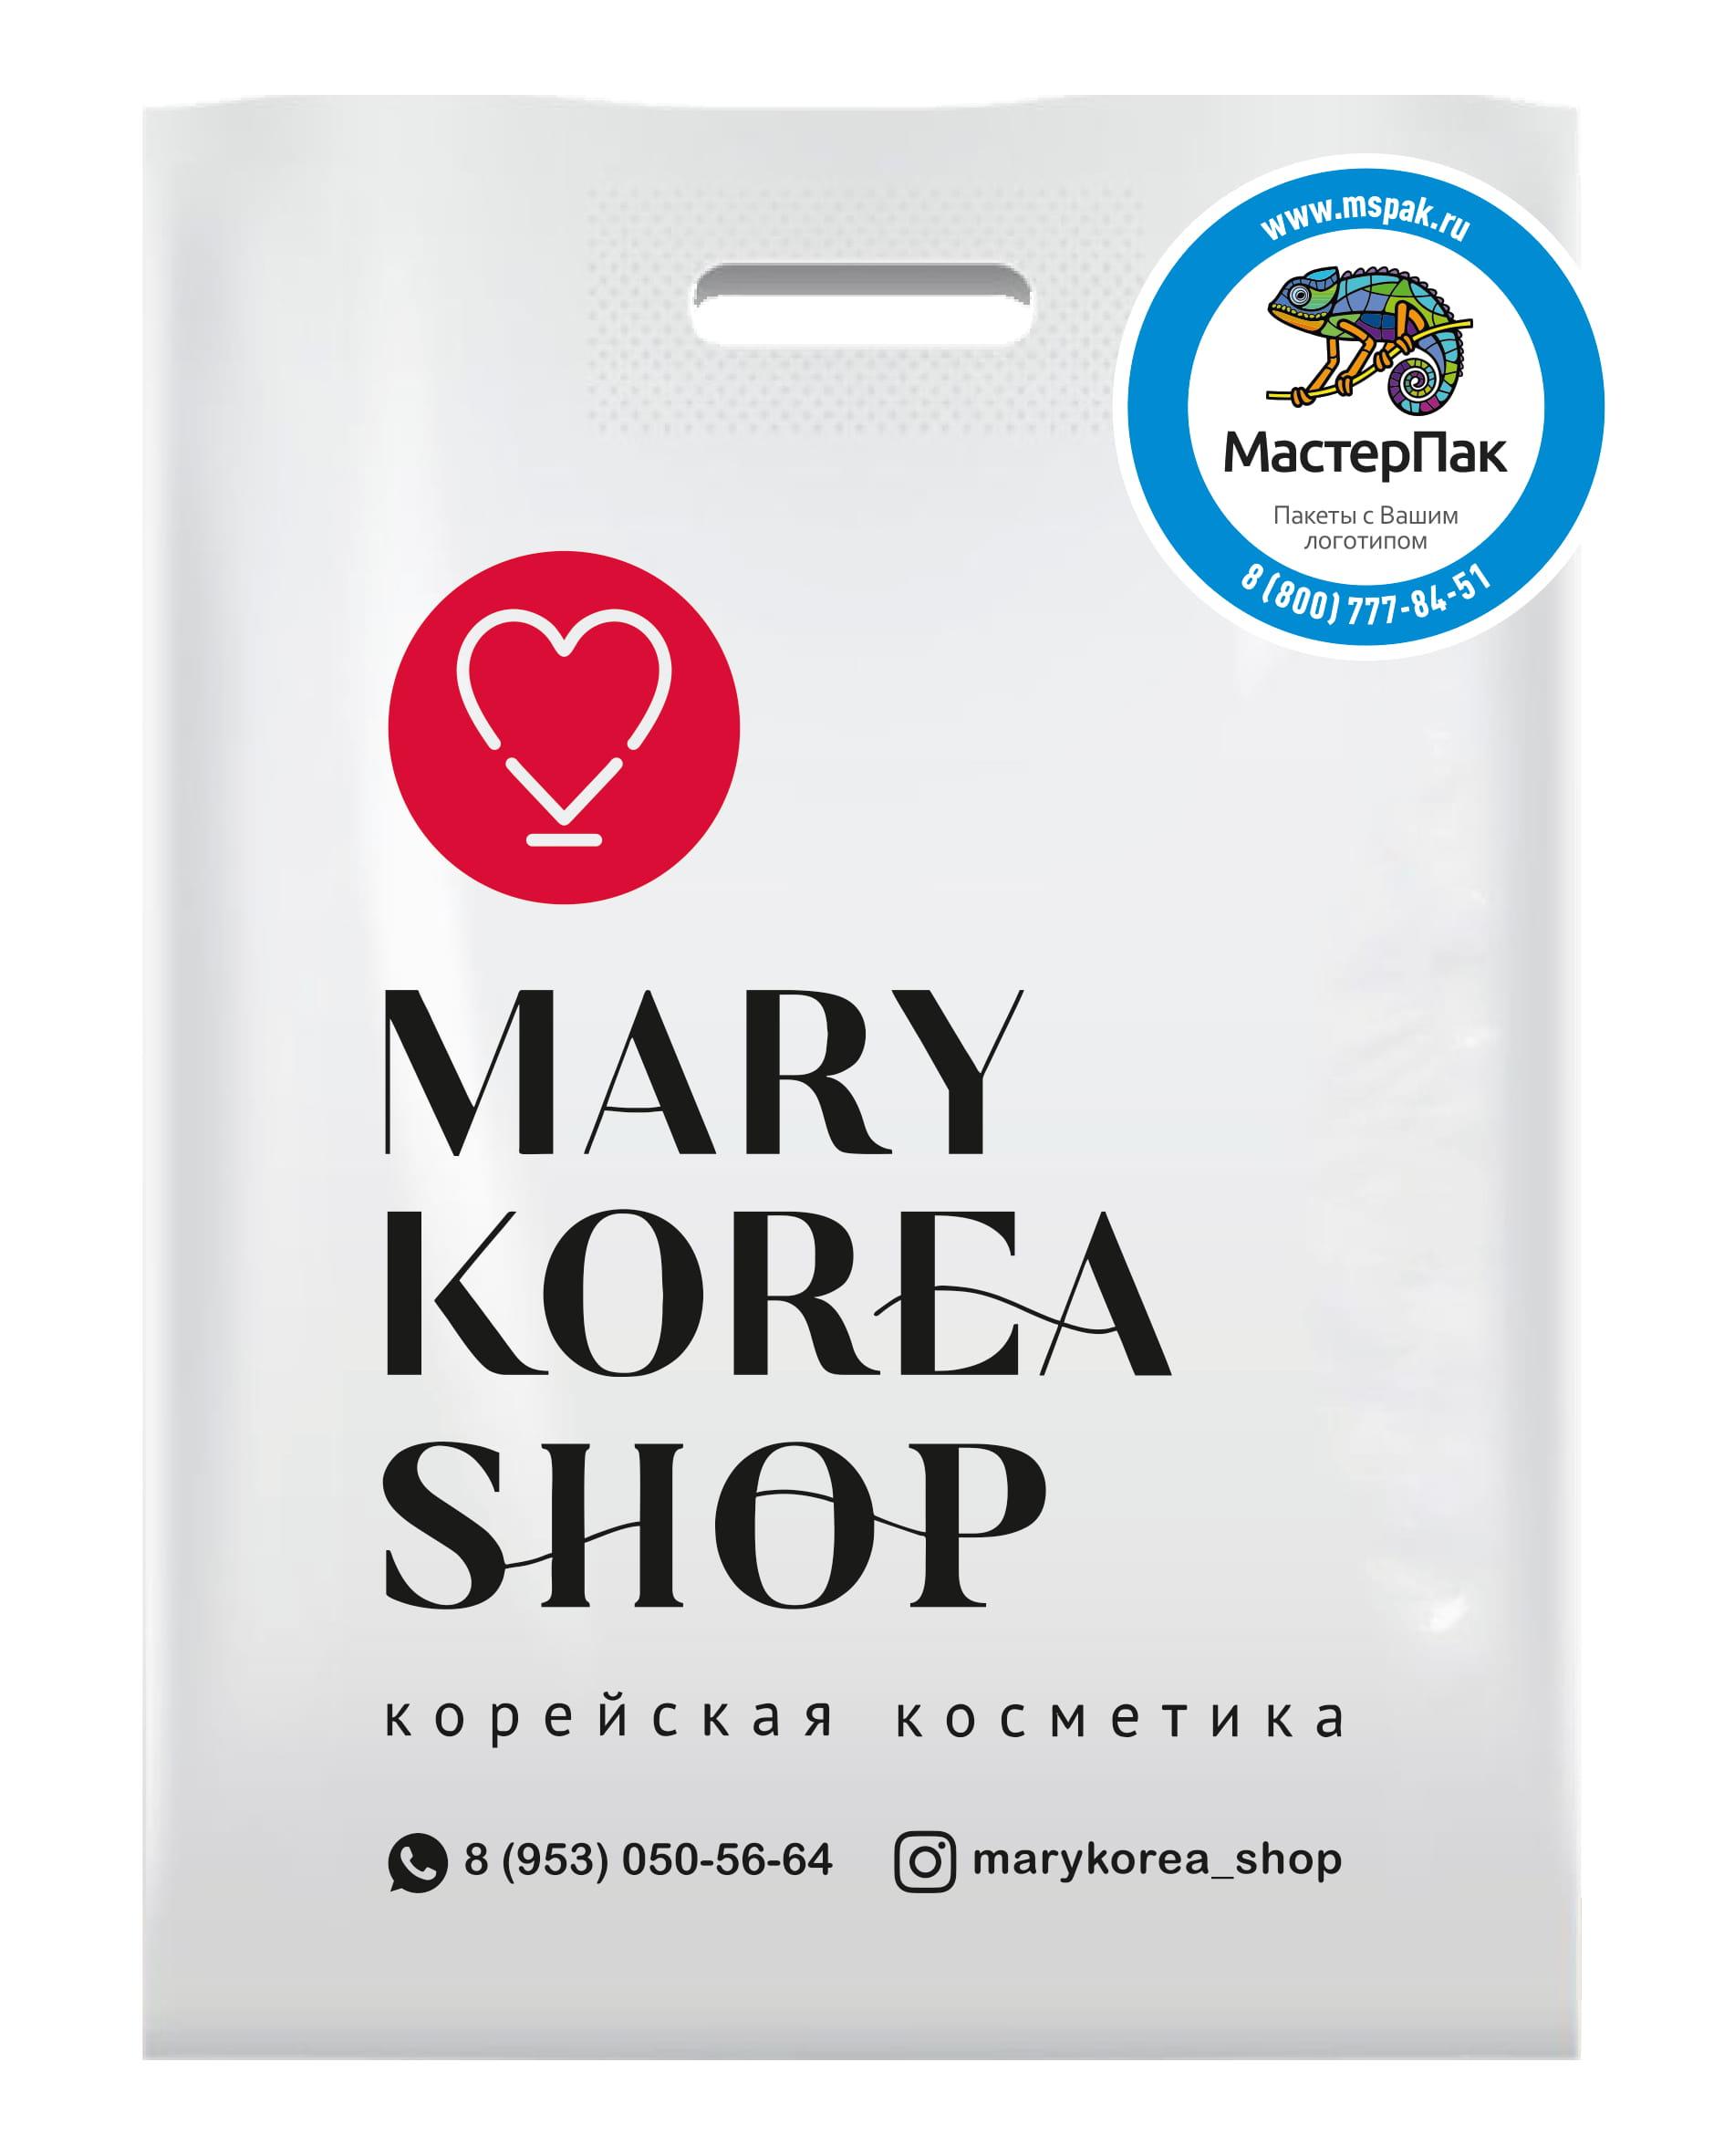 Пакет ПВД с логотипом магазина Mary Korea Shop, Оренбург